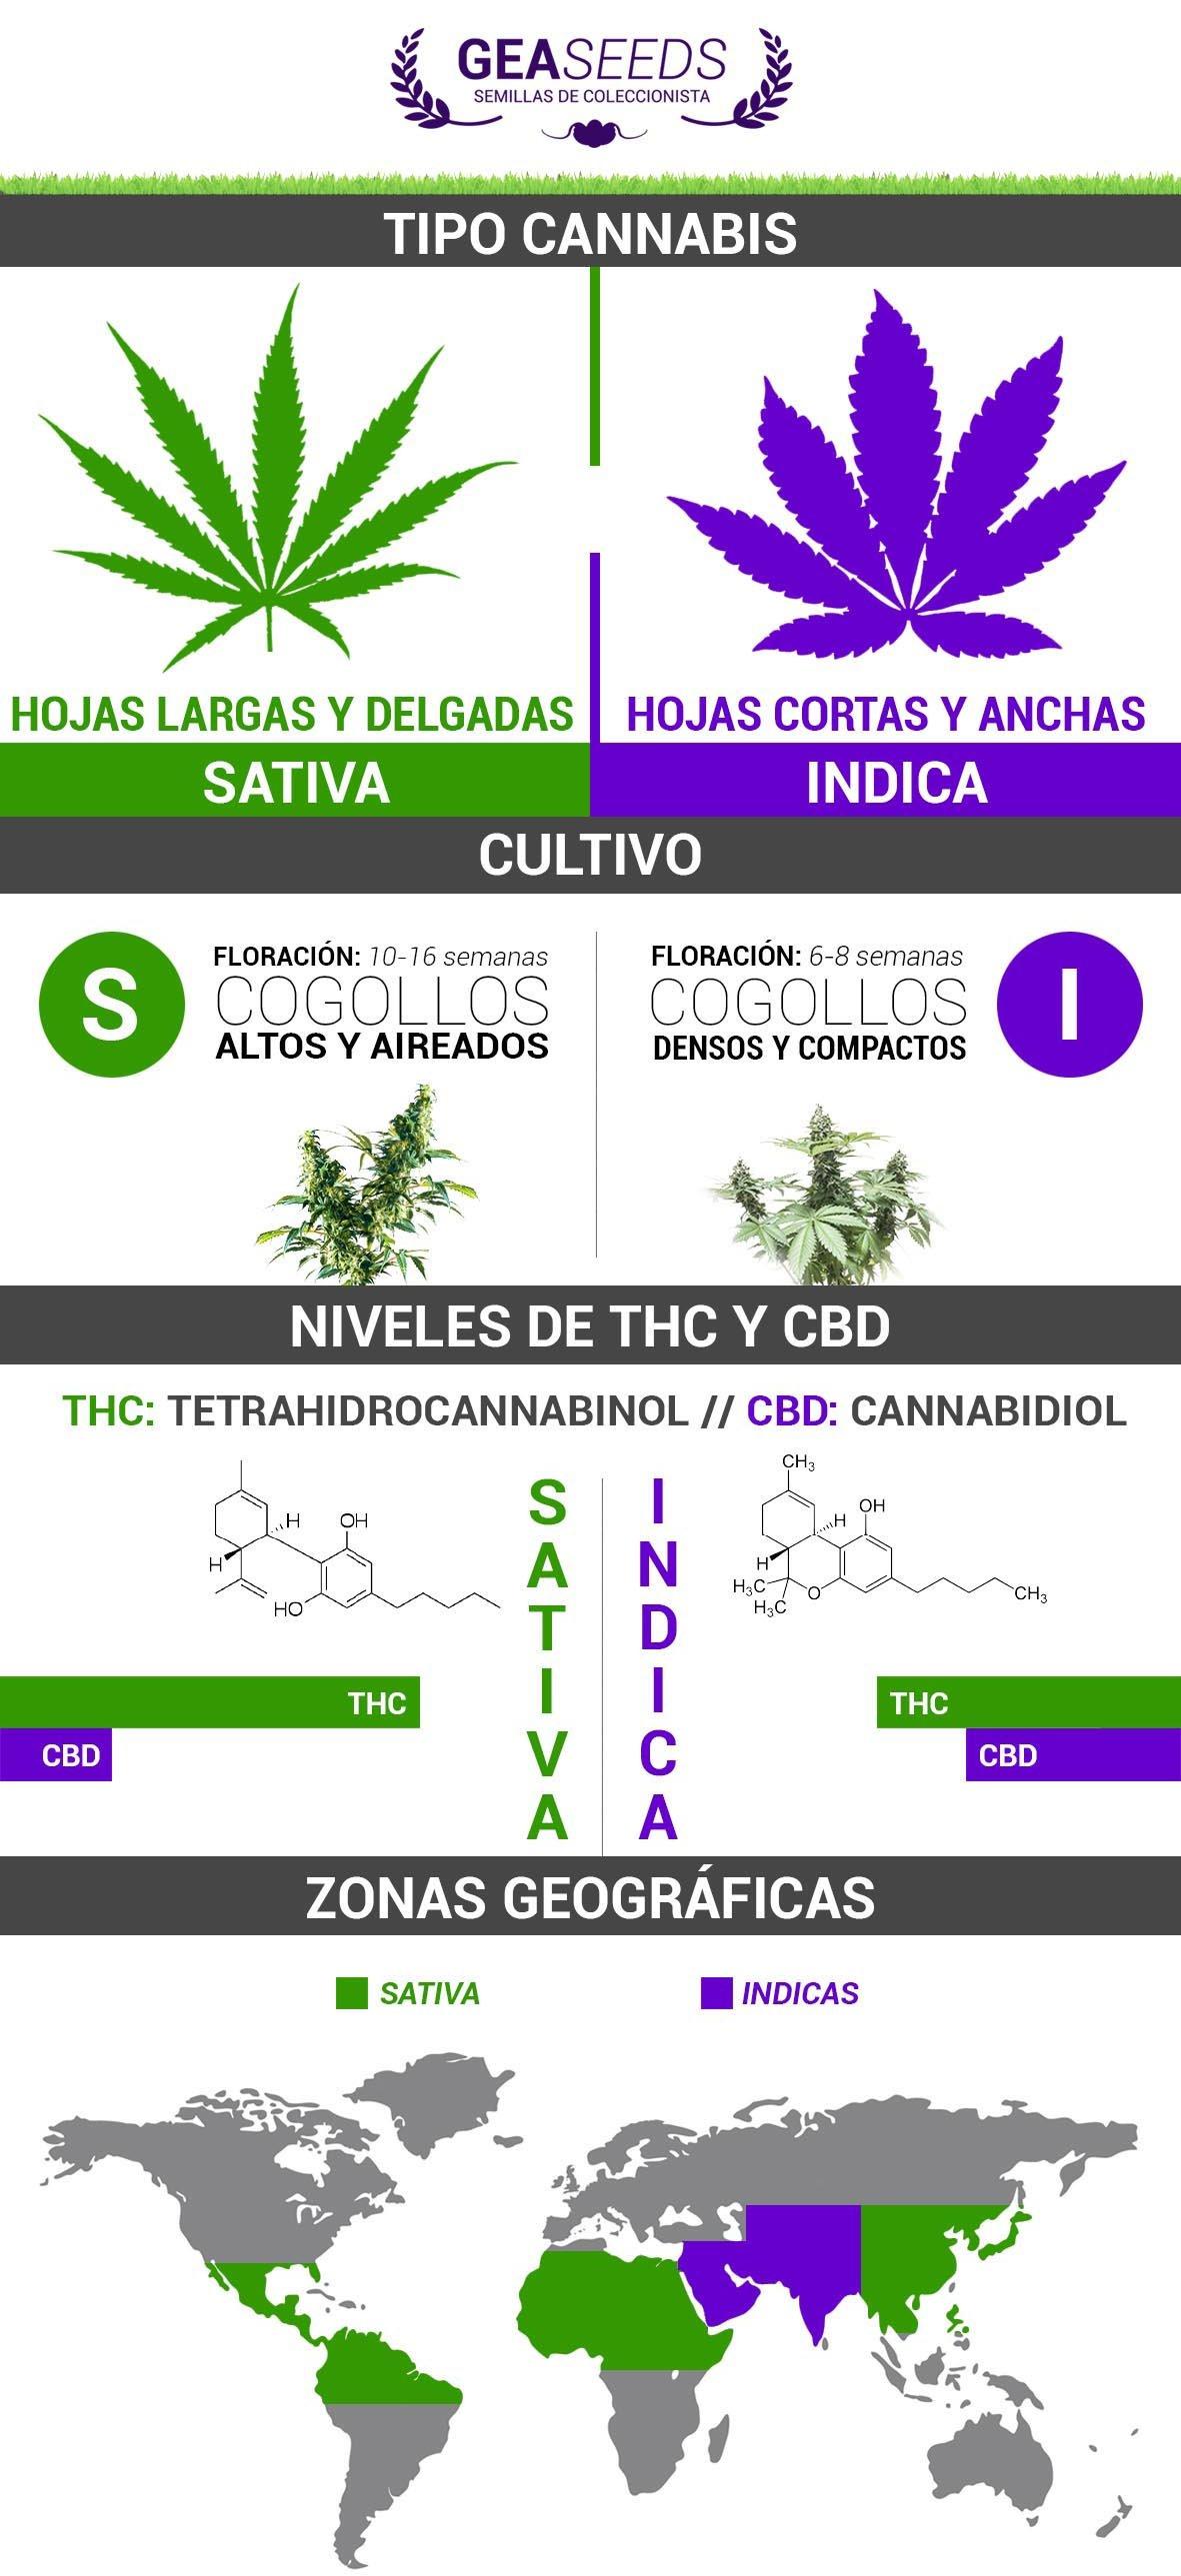 marihuanas sativas vs indicas